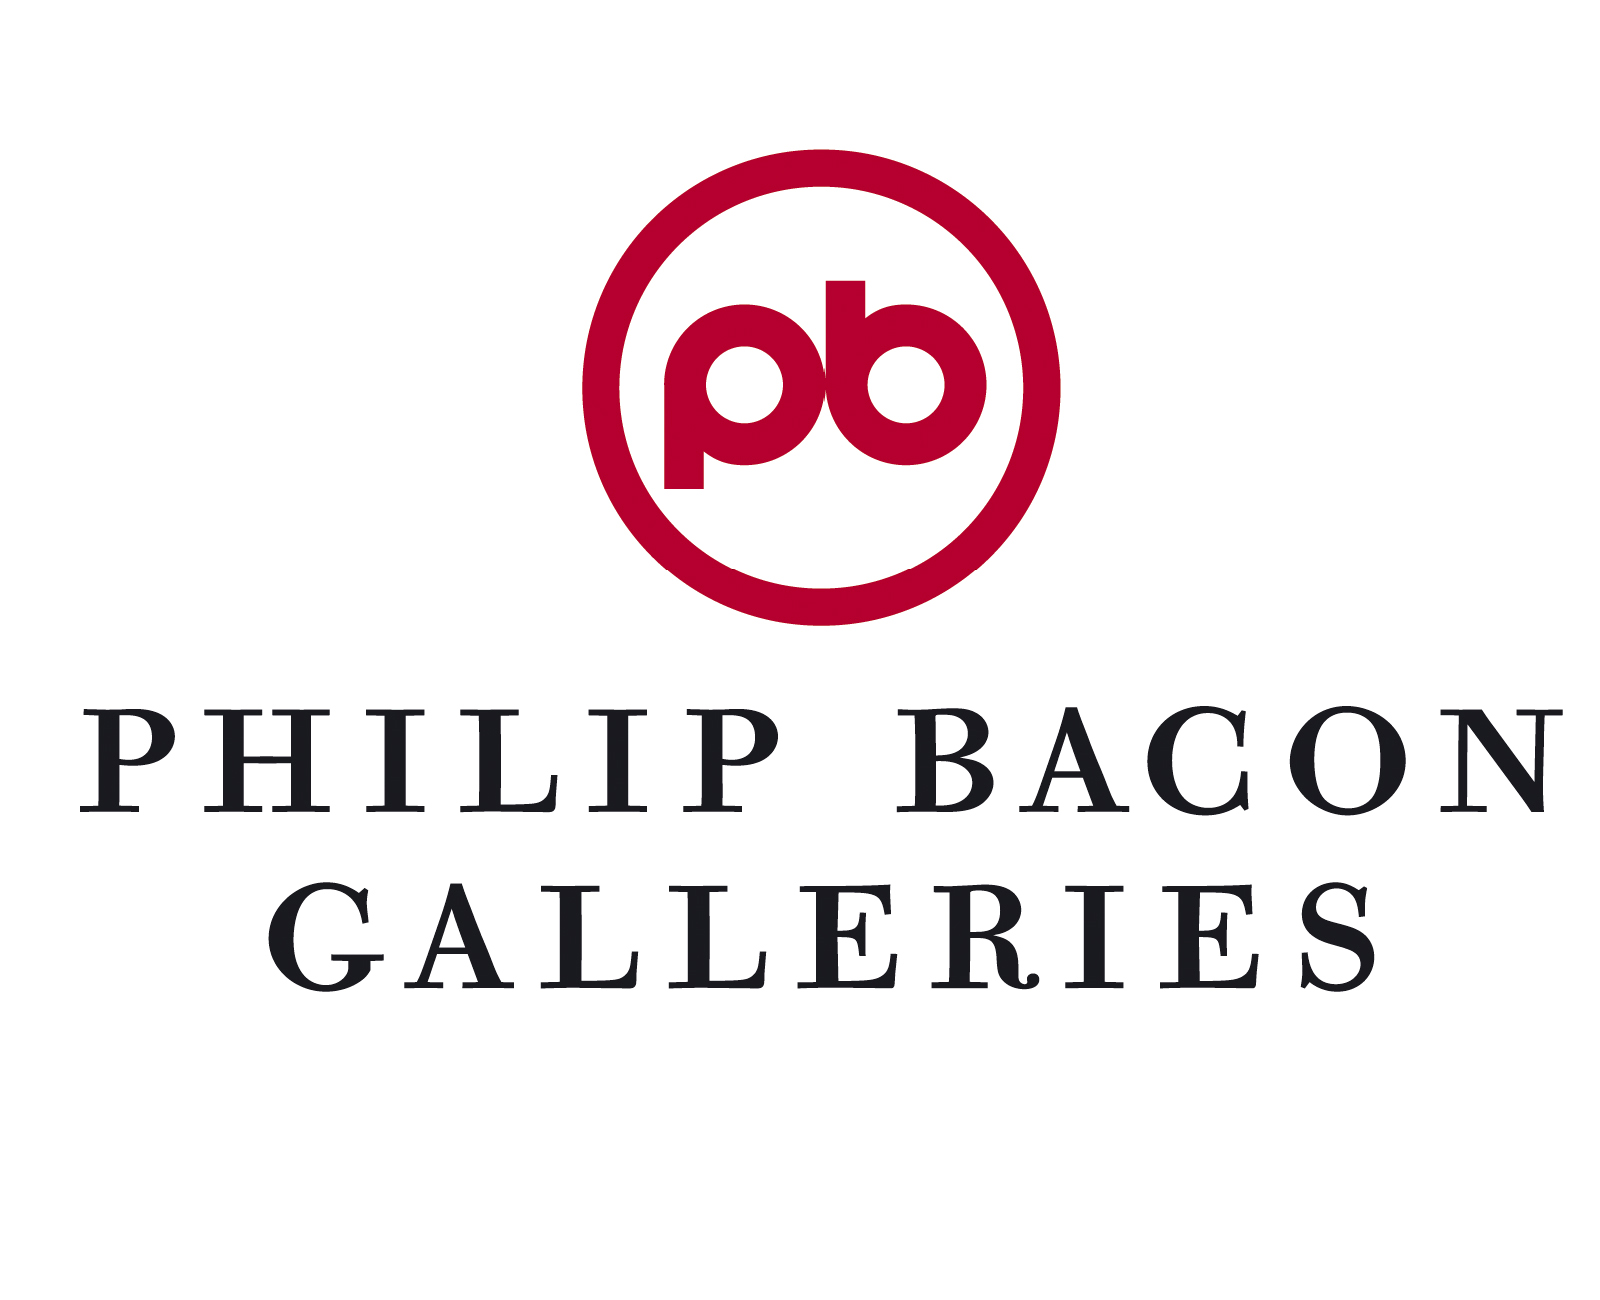 Phillip Bacon Galleries